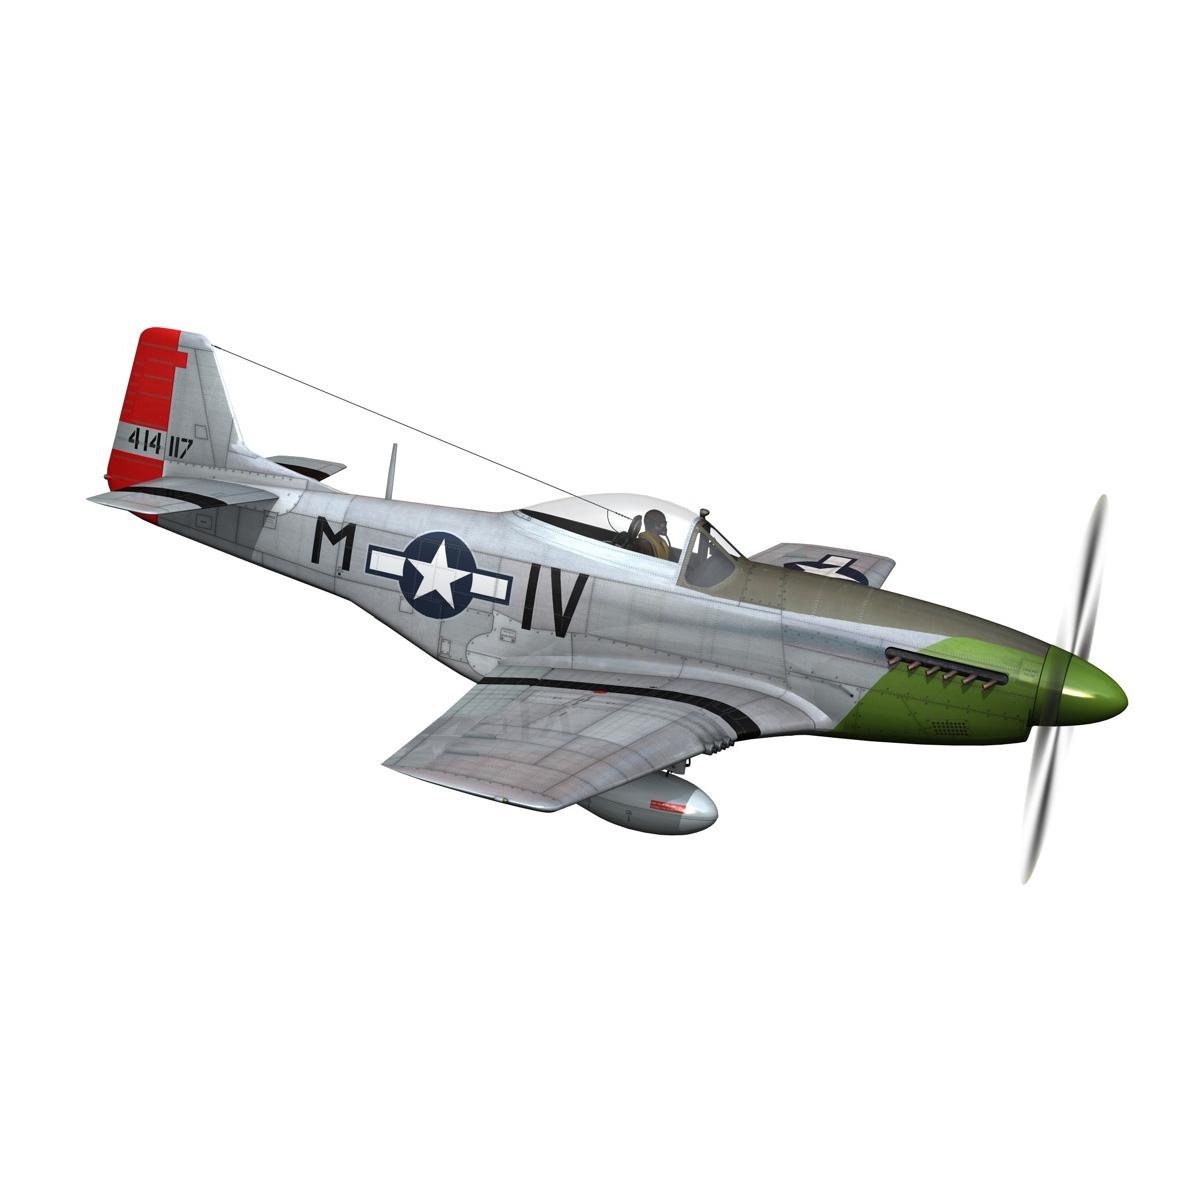 north american p-51d mustang – stinky 3d model fbx c4d lwo obj 269602